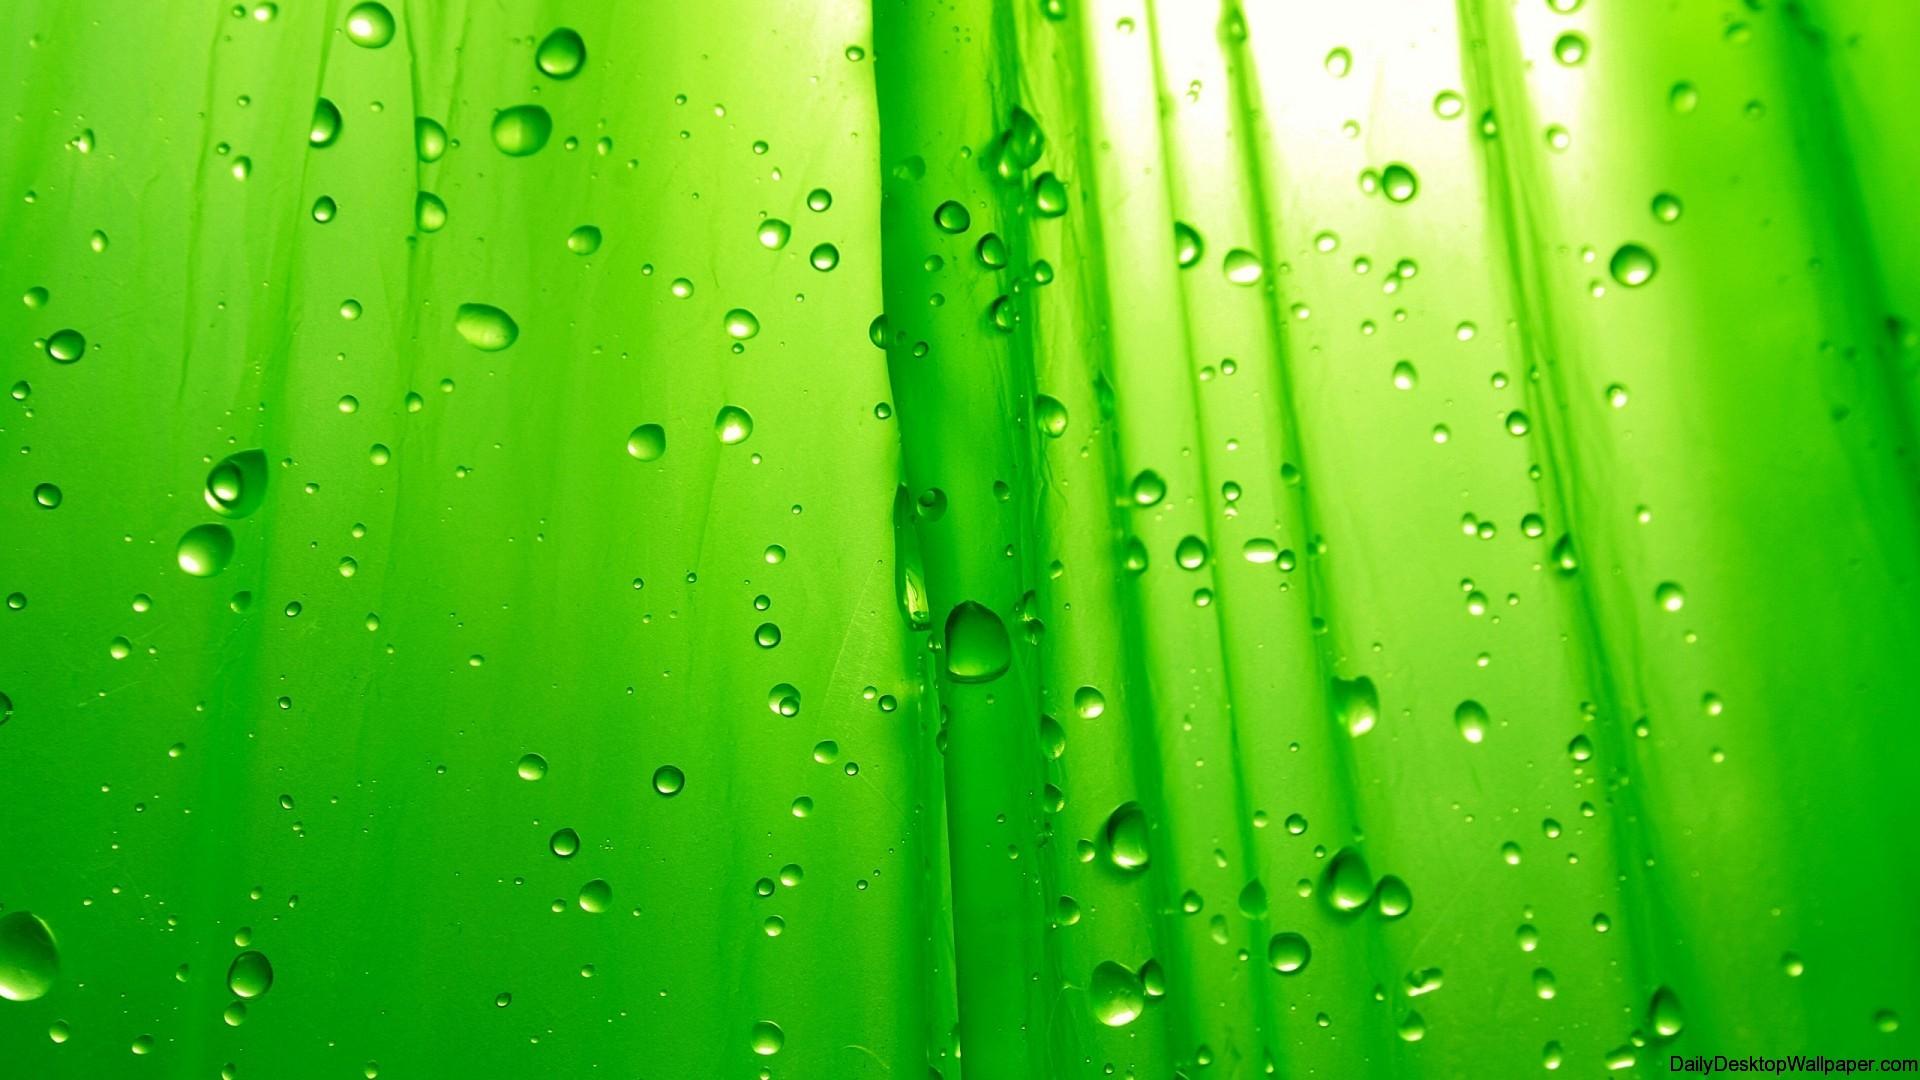 Raindrop Wallpaper Iphone X Green Raindrop Wallpaper Hd Wallpapers